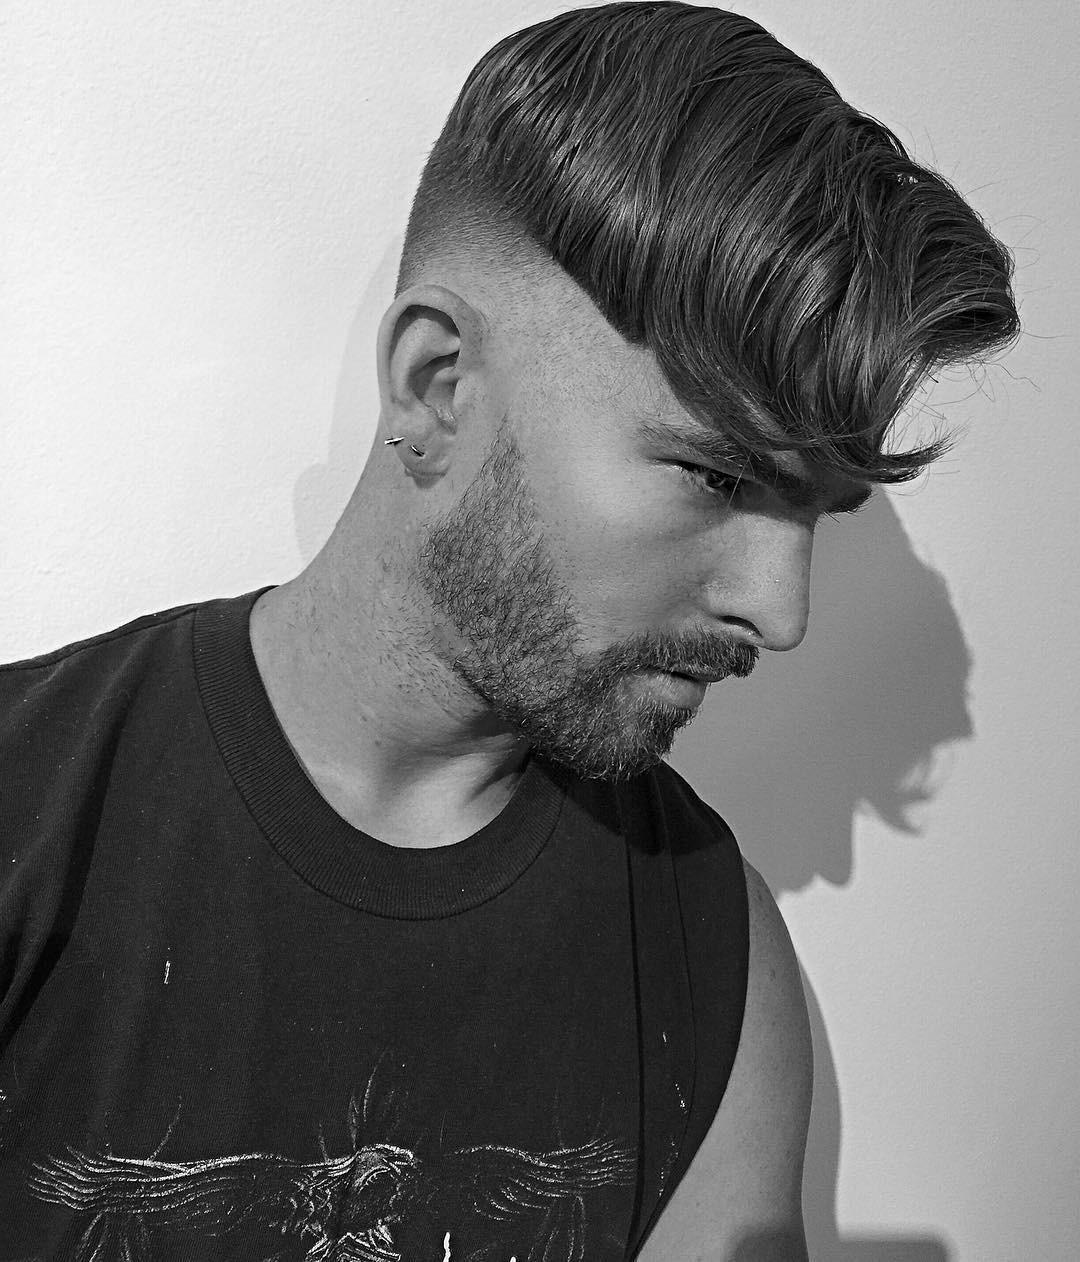 Undercut Mens Hairstyle  21 New Undercut Hairstyles For Men